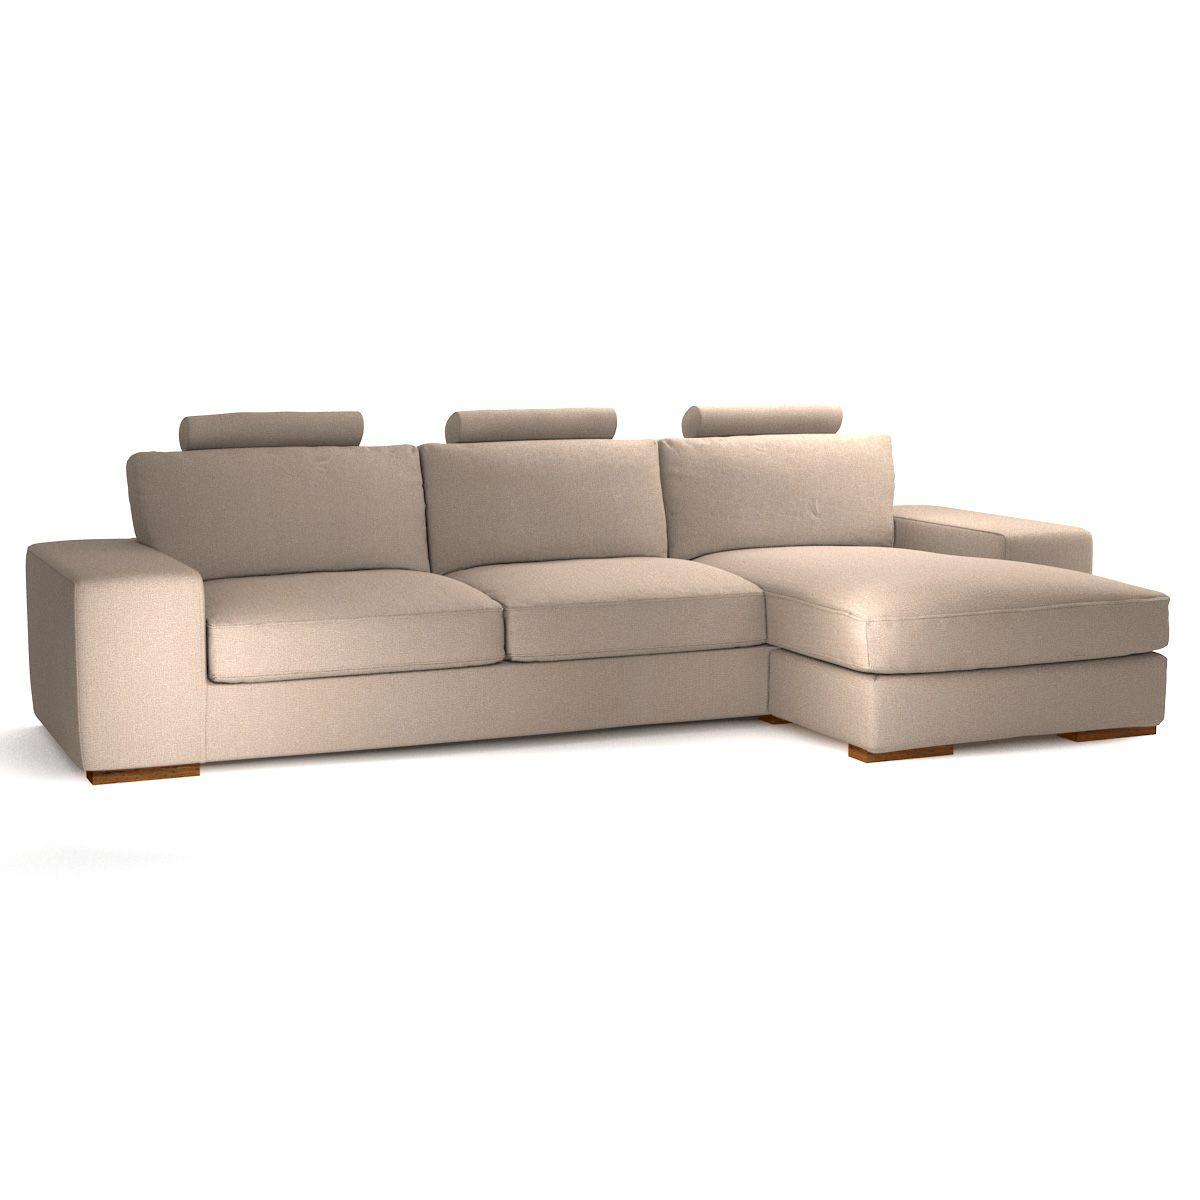 Sofas Corner Sofa Sofa Sofa Seats